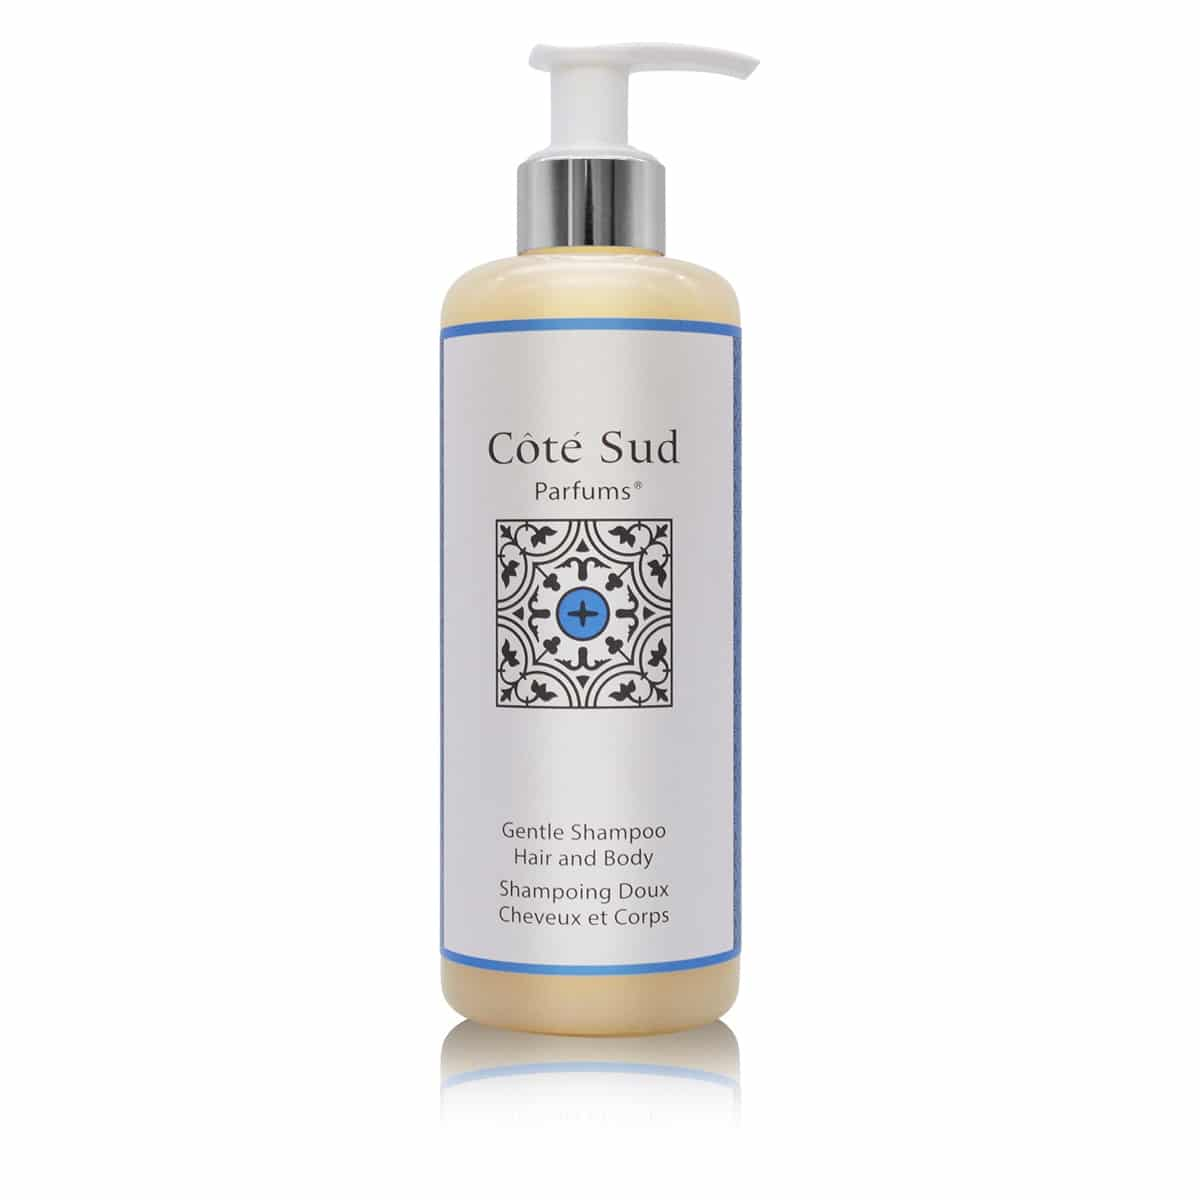 Extra Gentle Shampoo for hair & body | Côté Sud Parfums